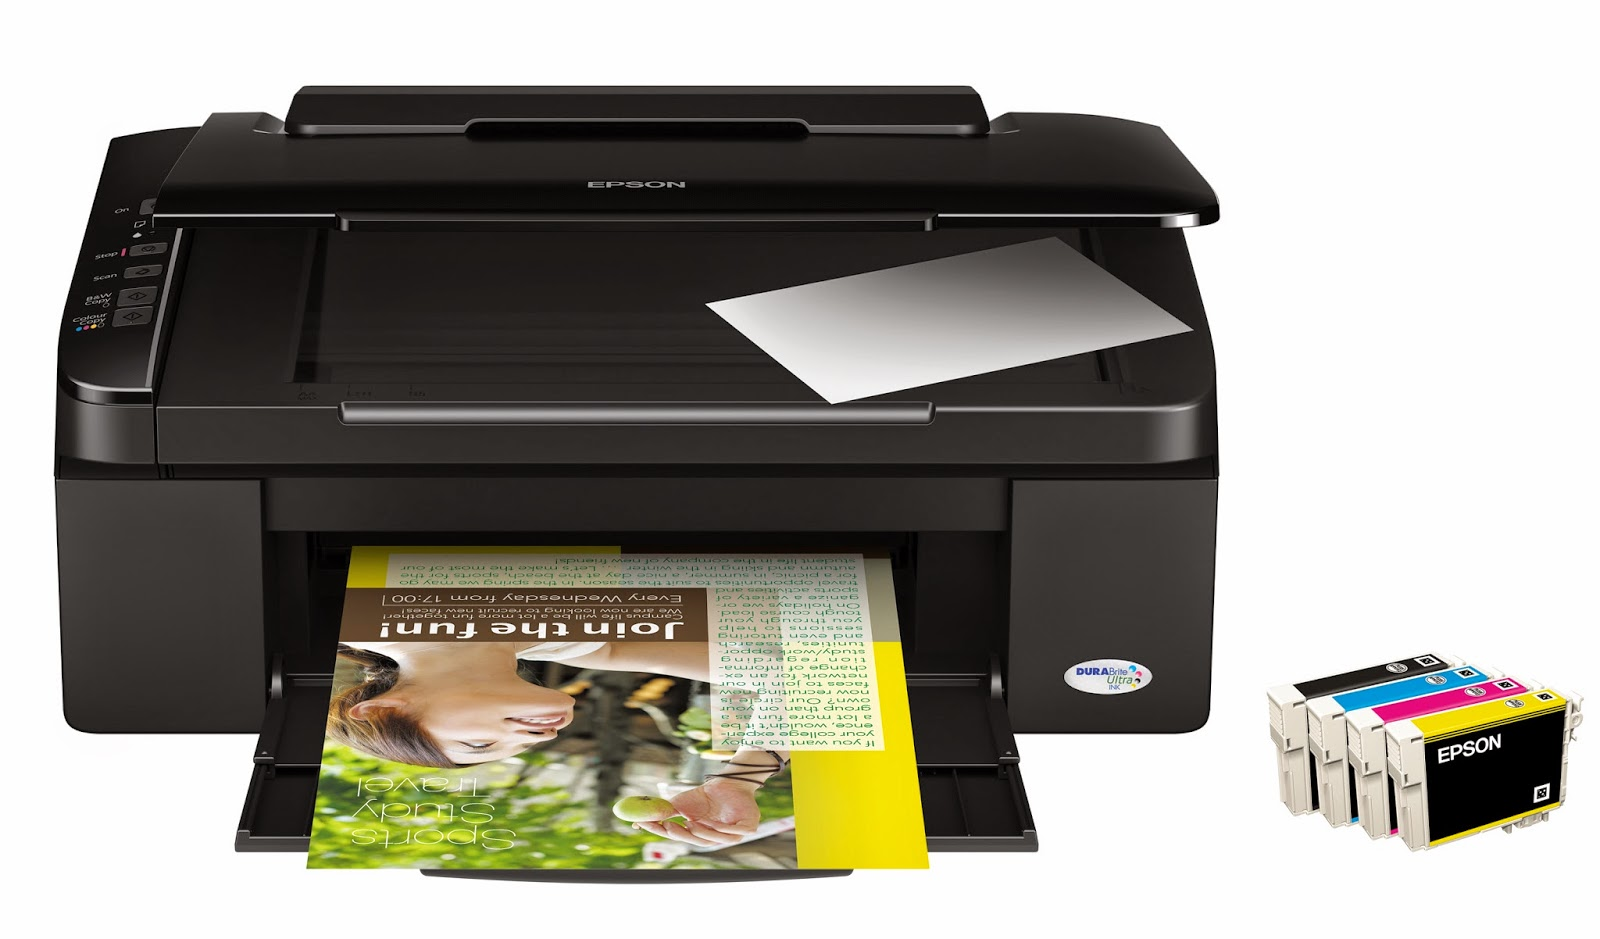 Epson Stylus SX110 Driver Download - Driver Printer